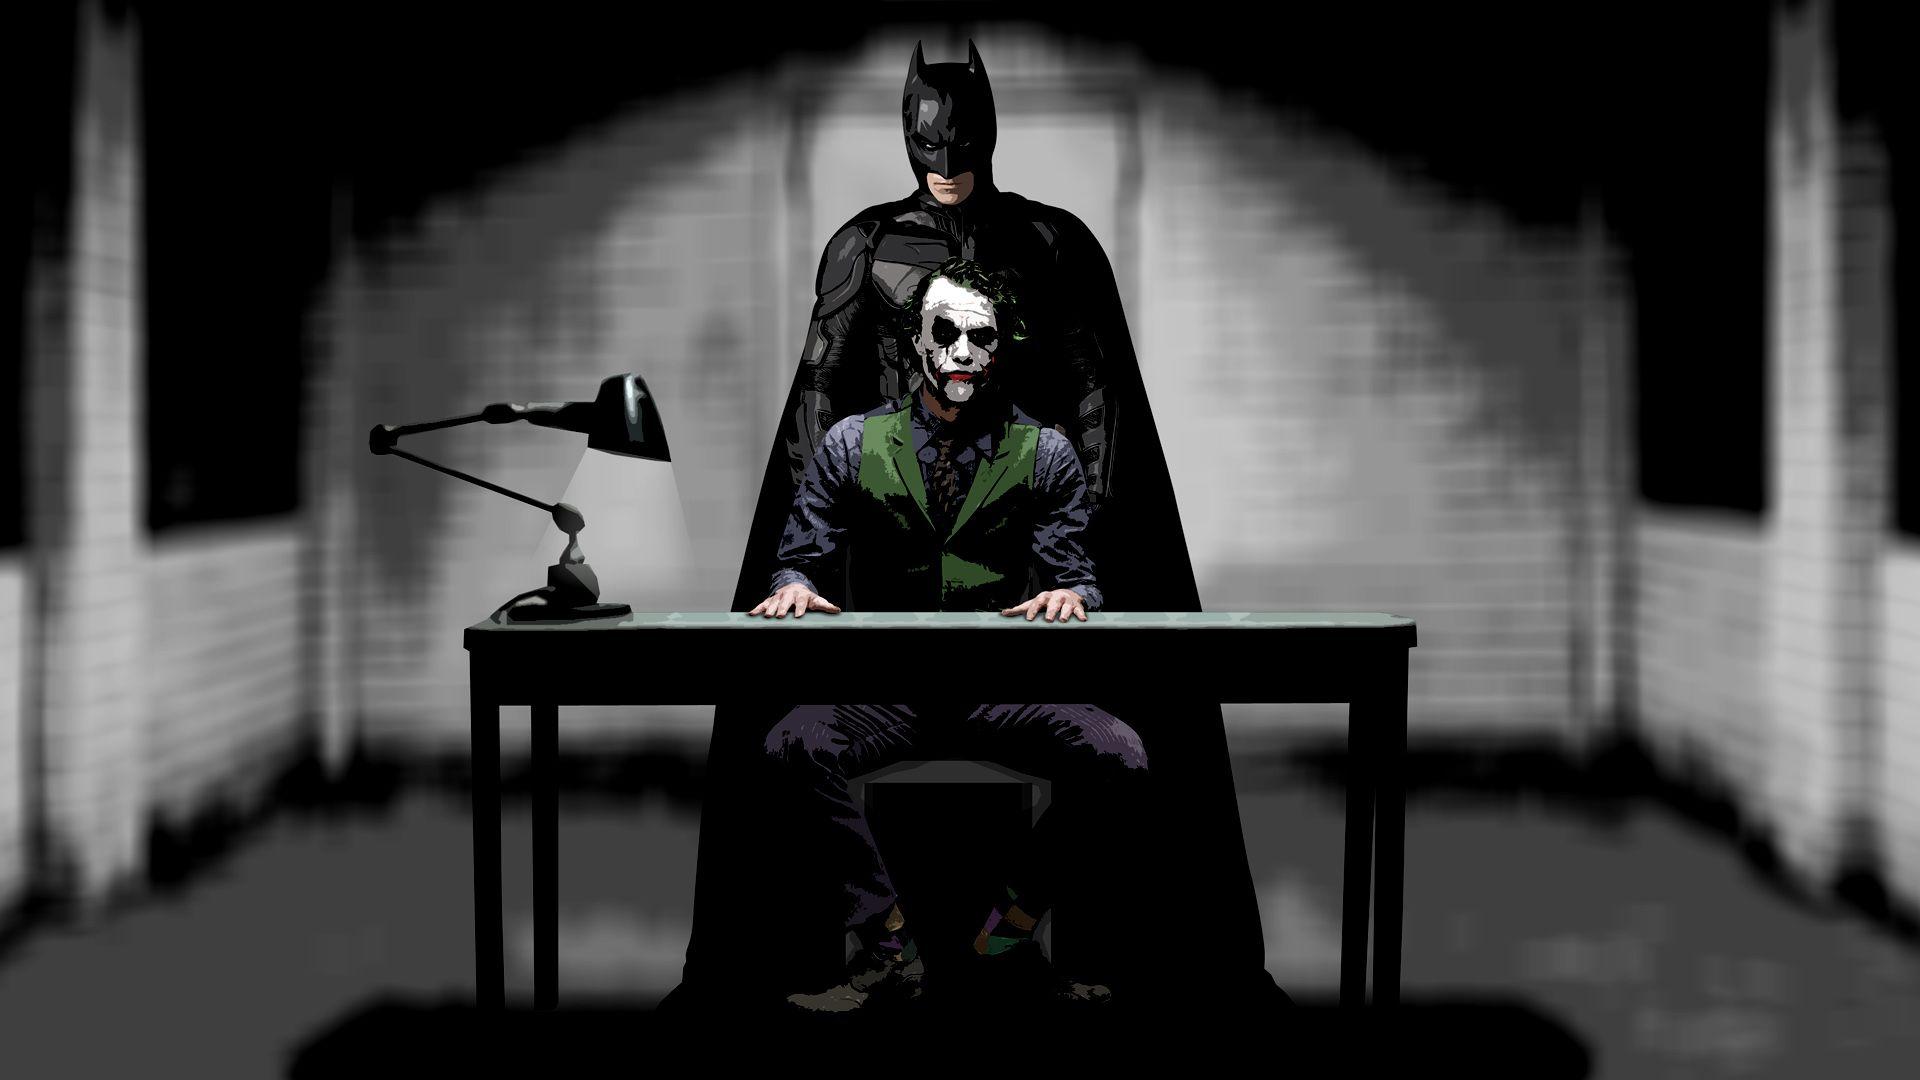 Collection of Batman Joker Wallpapers on HDWallpapers